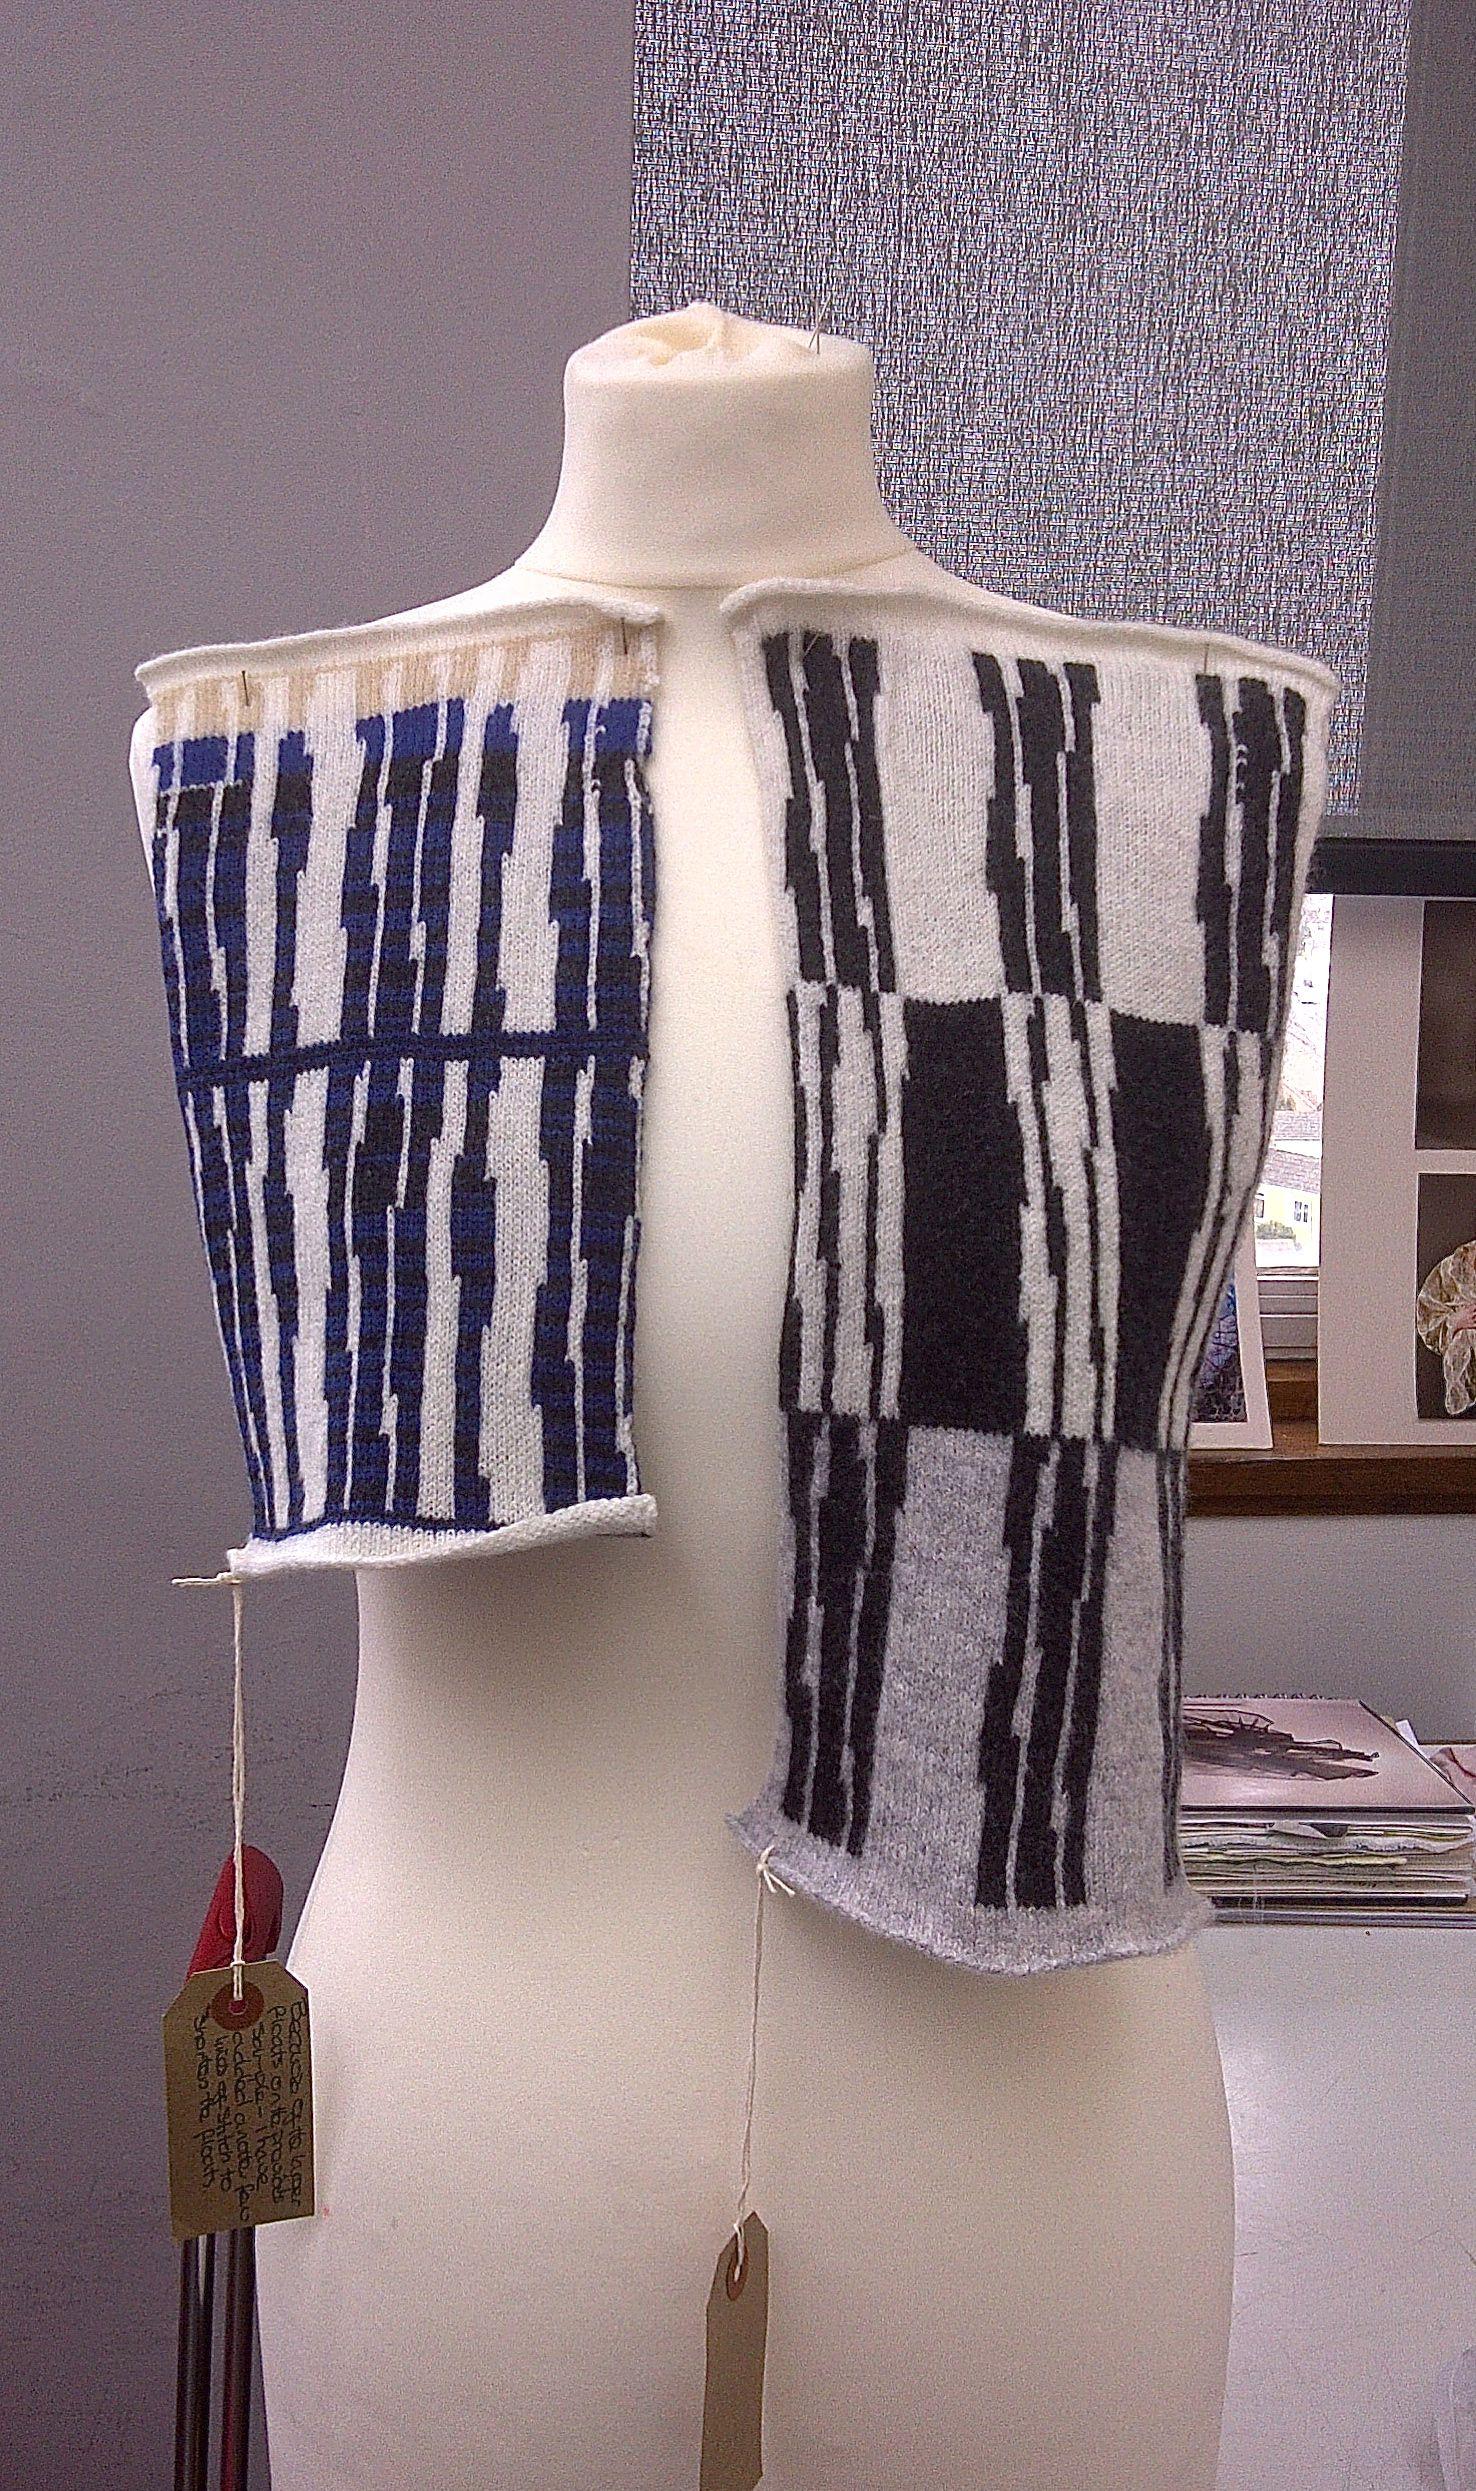 Sea inspired machine knit 2014